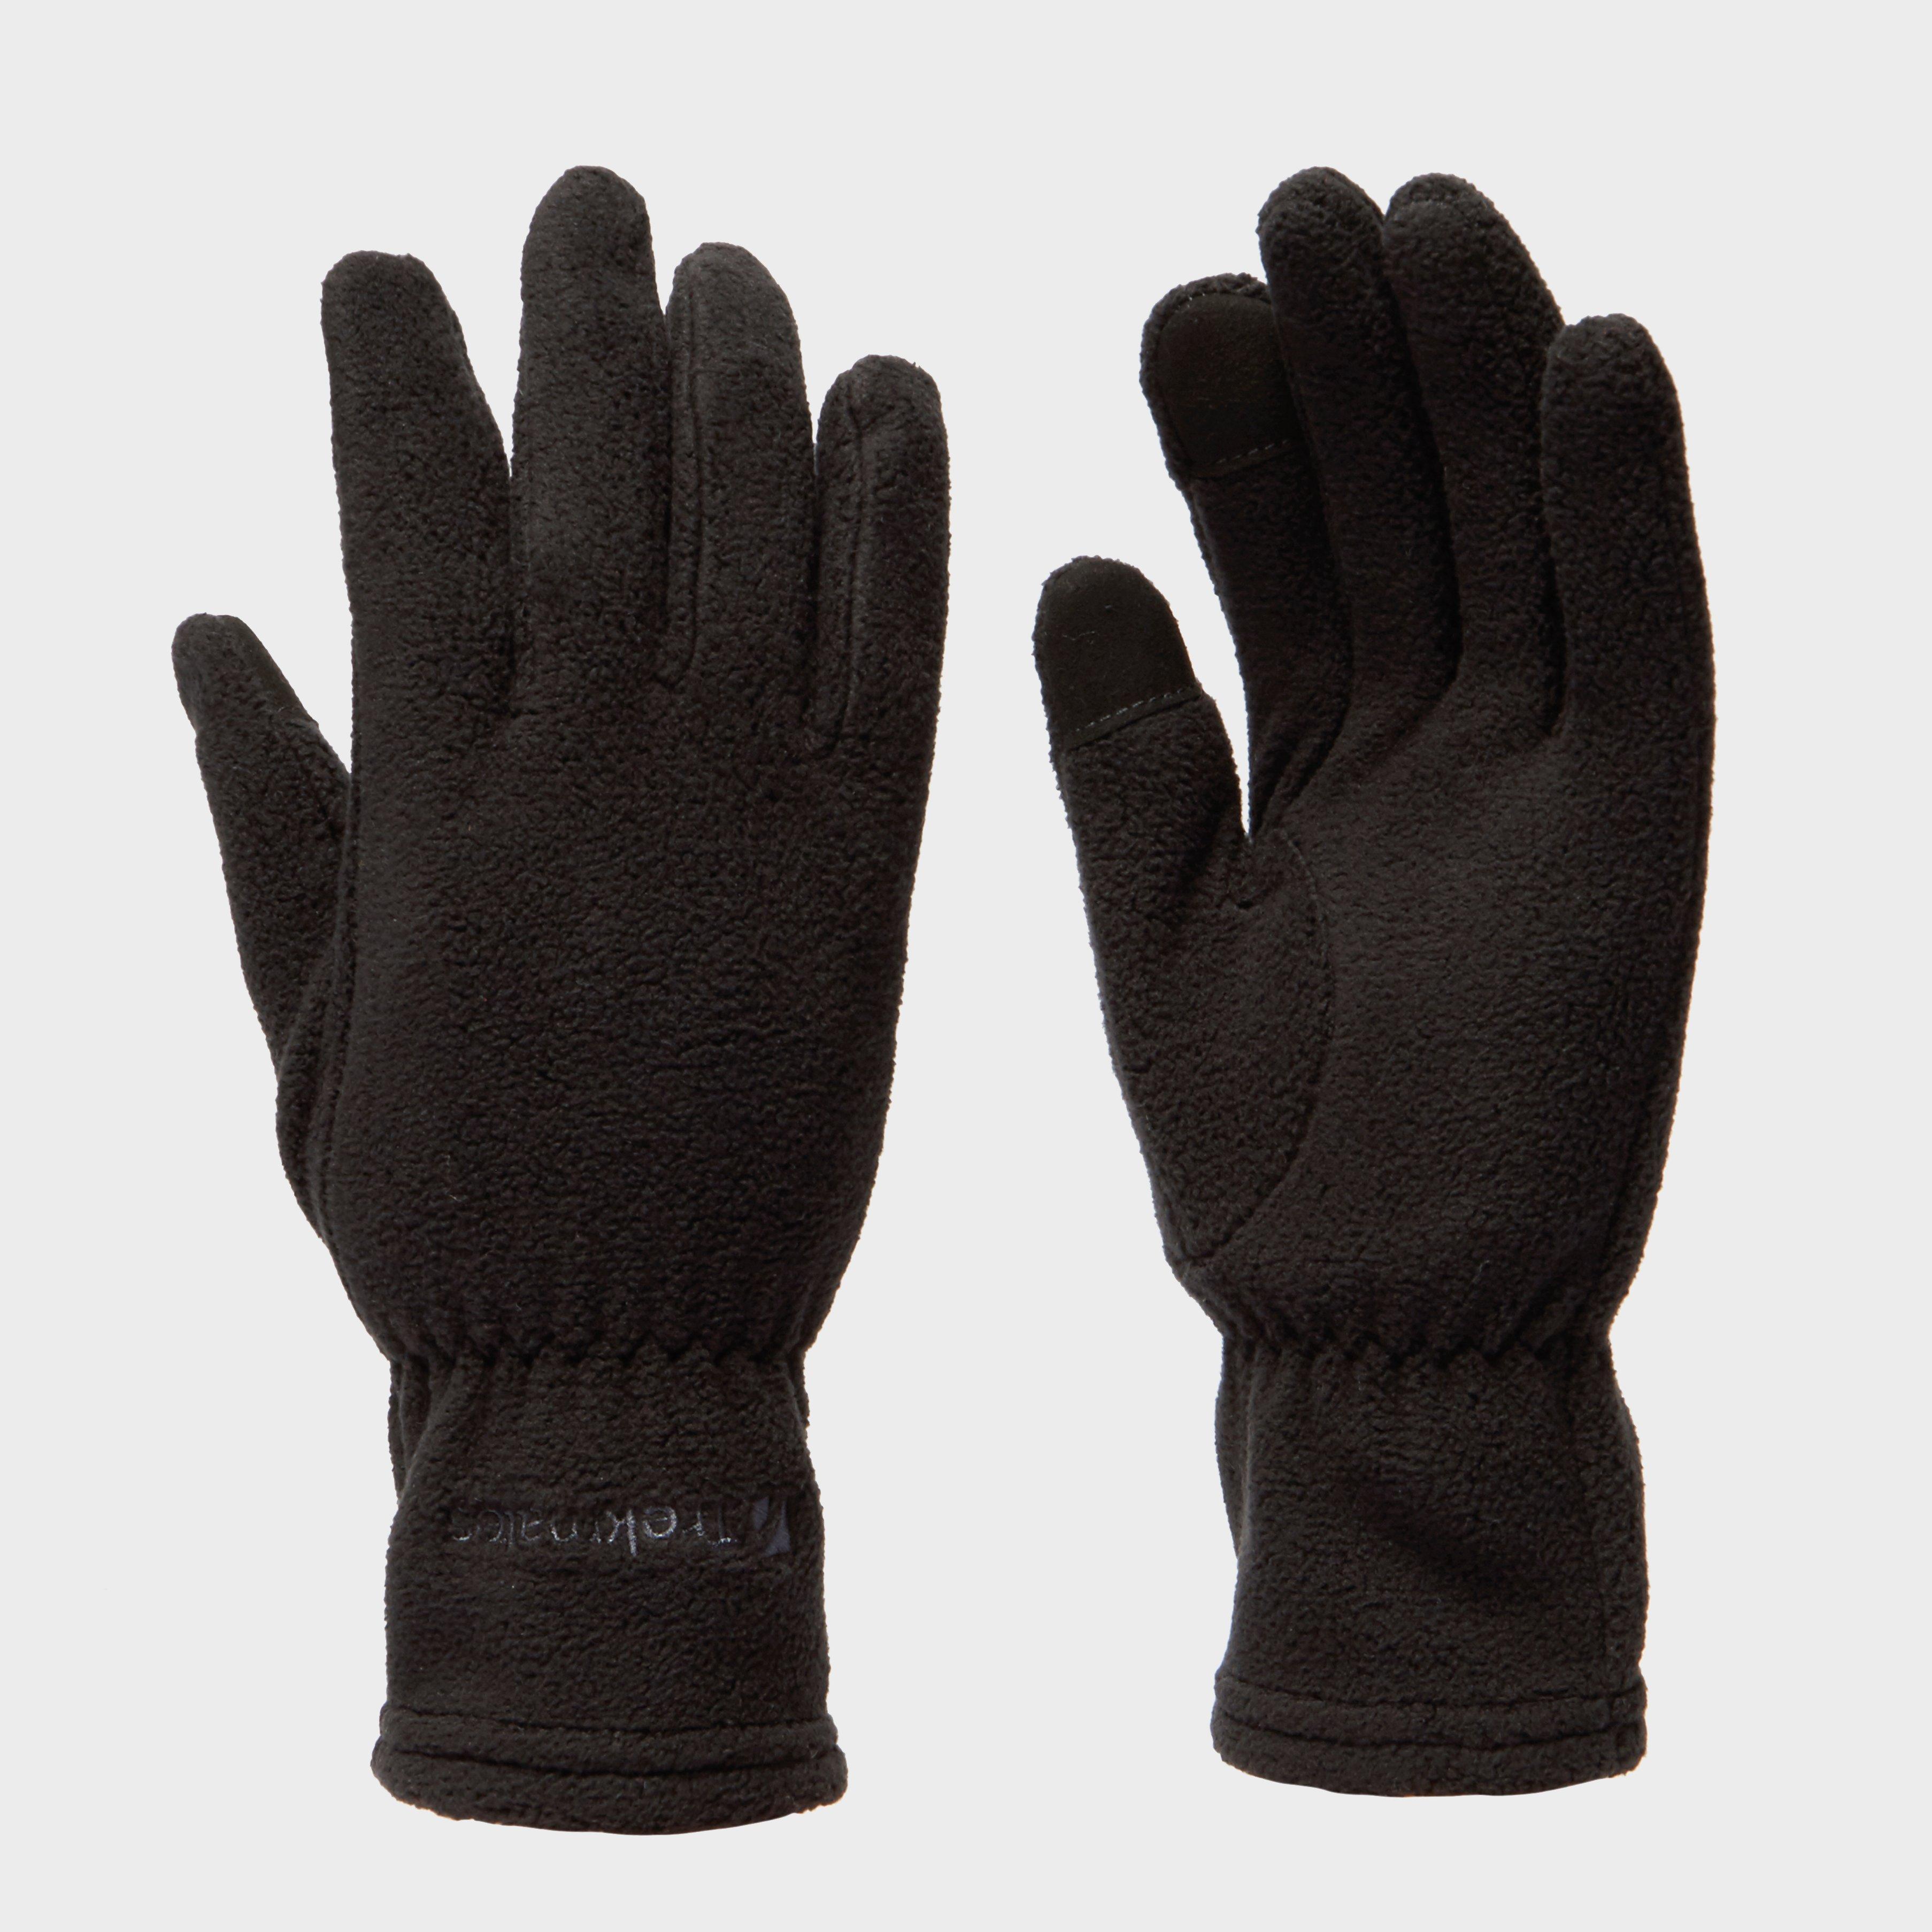 Trekmates Trekmates Womens Touchscreen Fleece Gloves - Black, Black